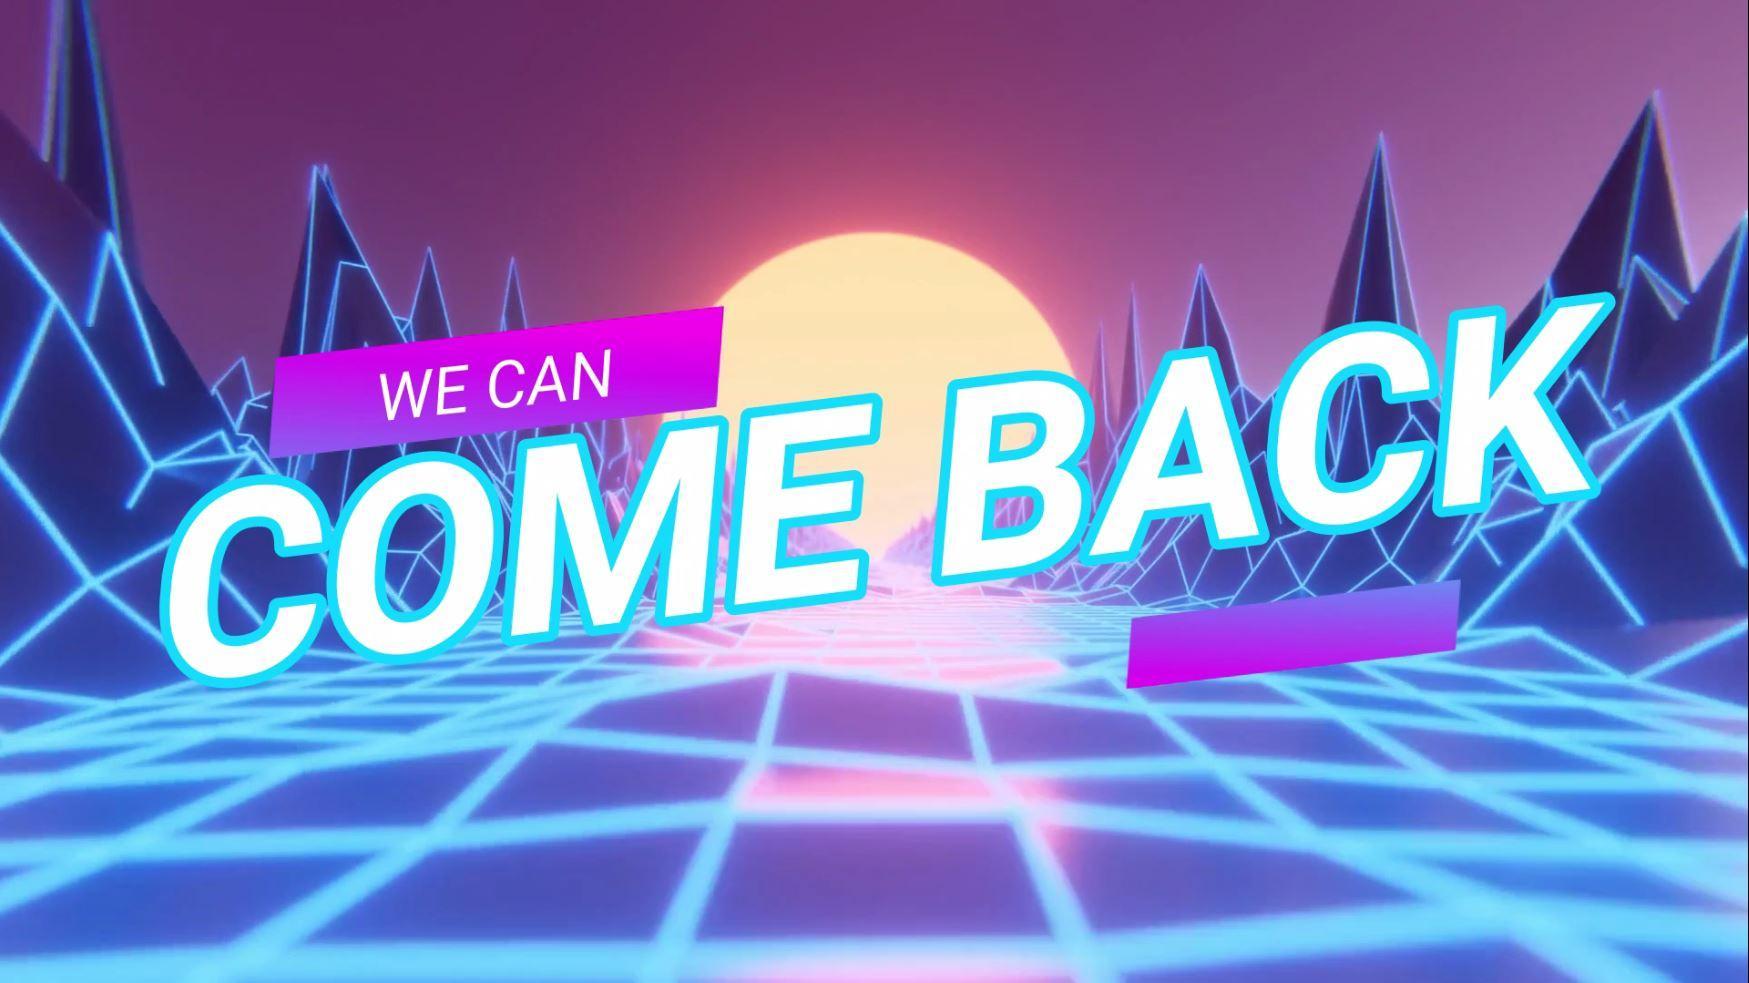 WE CAN COME BACK Original Mix